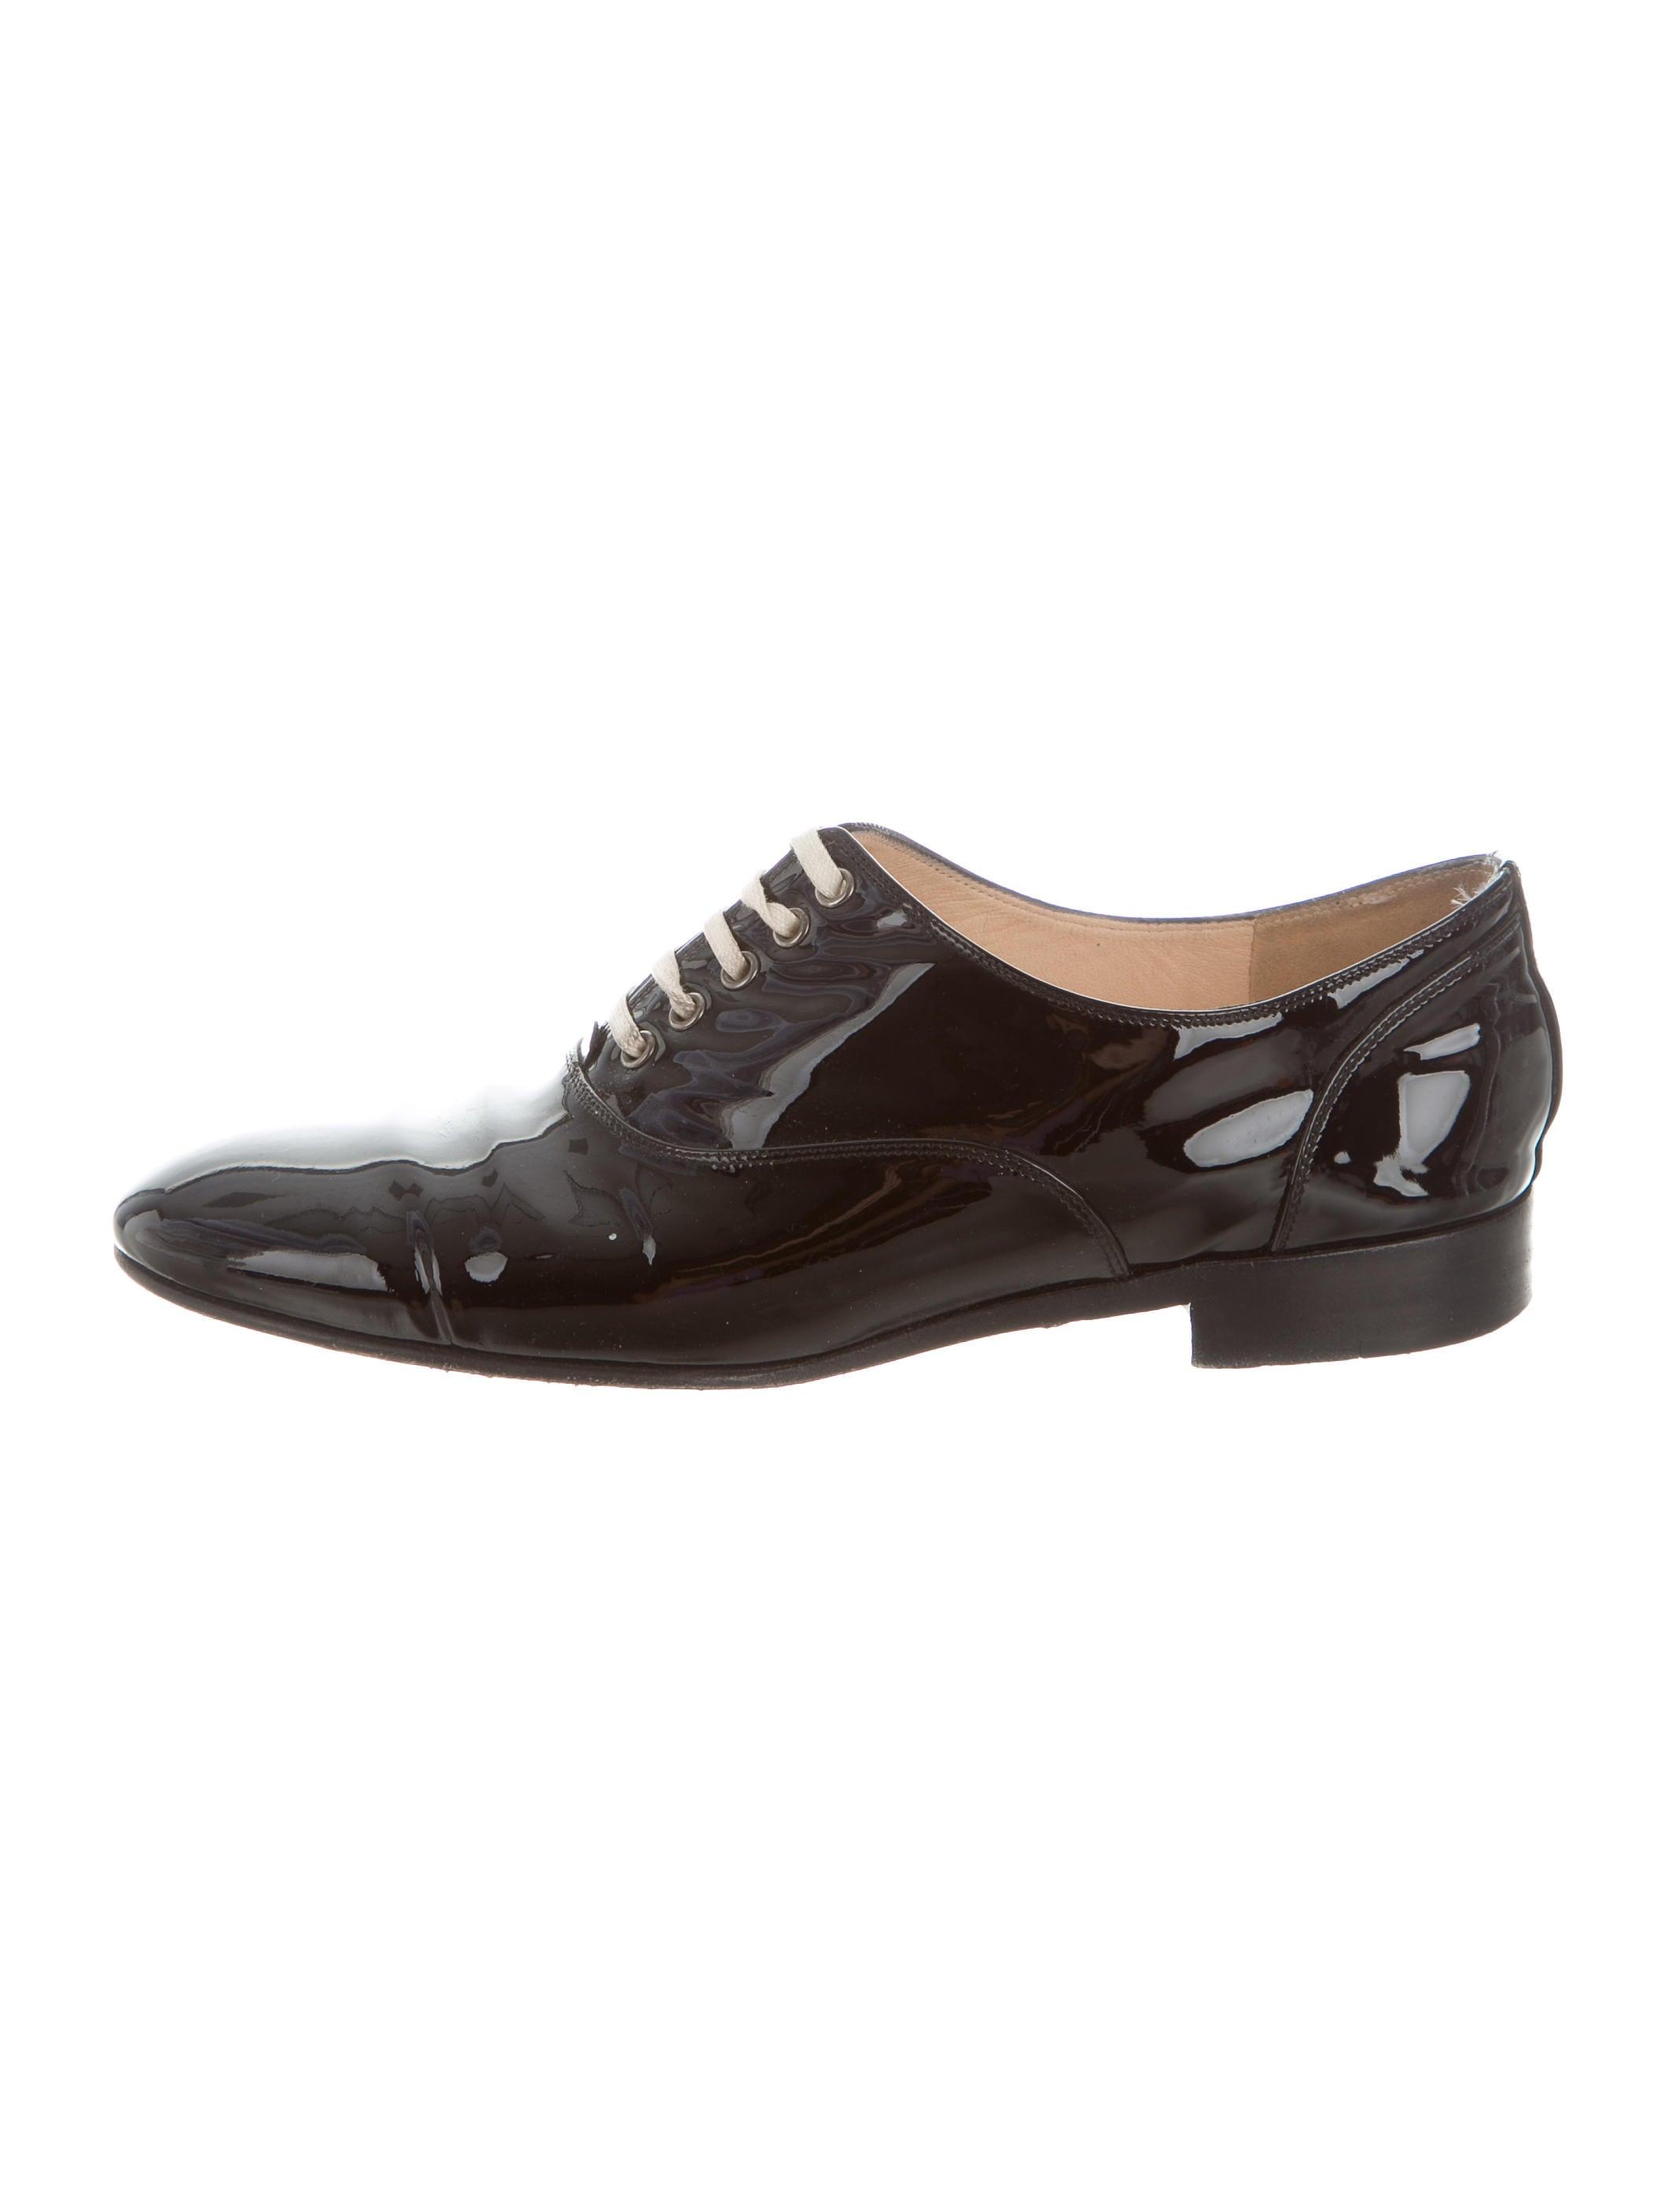 Loafers Patent Calfskin & Grosgrain, Black Ref. GY $1,* Mules Laminated Goatskin & Patent Calfskin, dark green & black Ref. GYK $* Loafers Velvet, Grosgrain & Pearls, Black Ref. GY